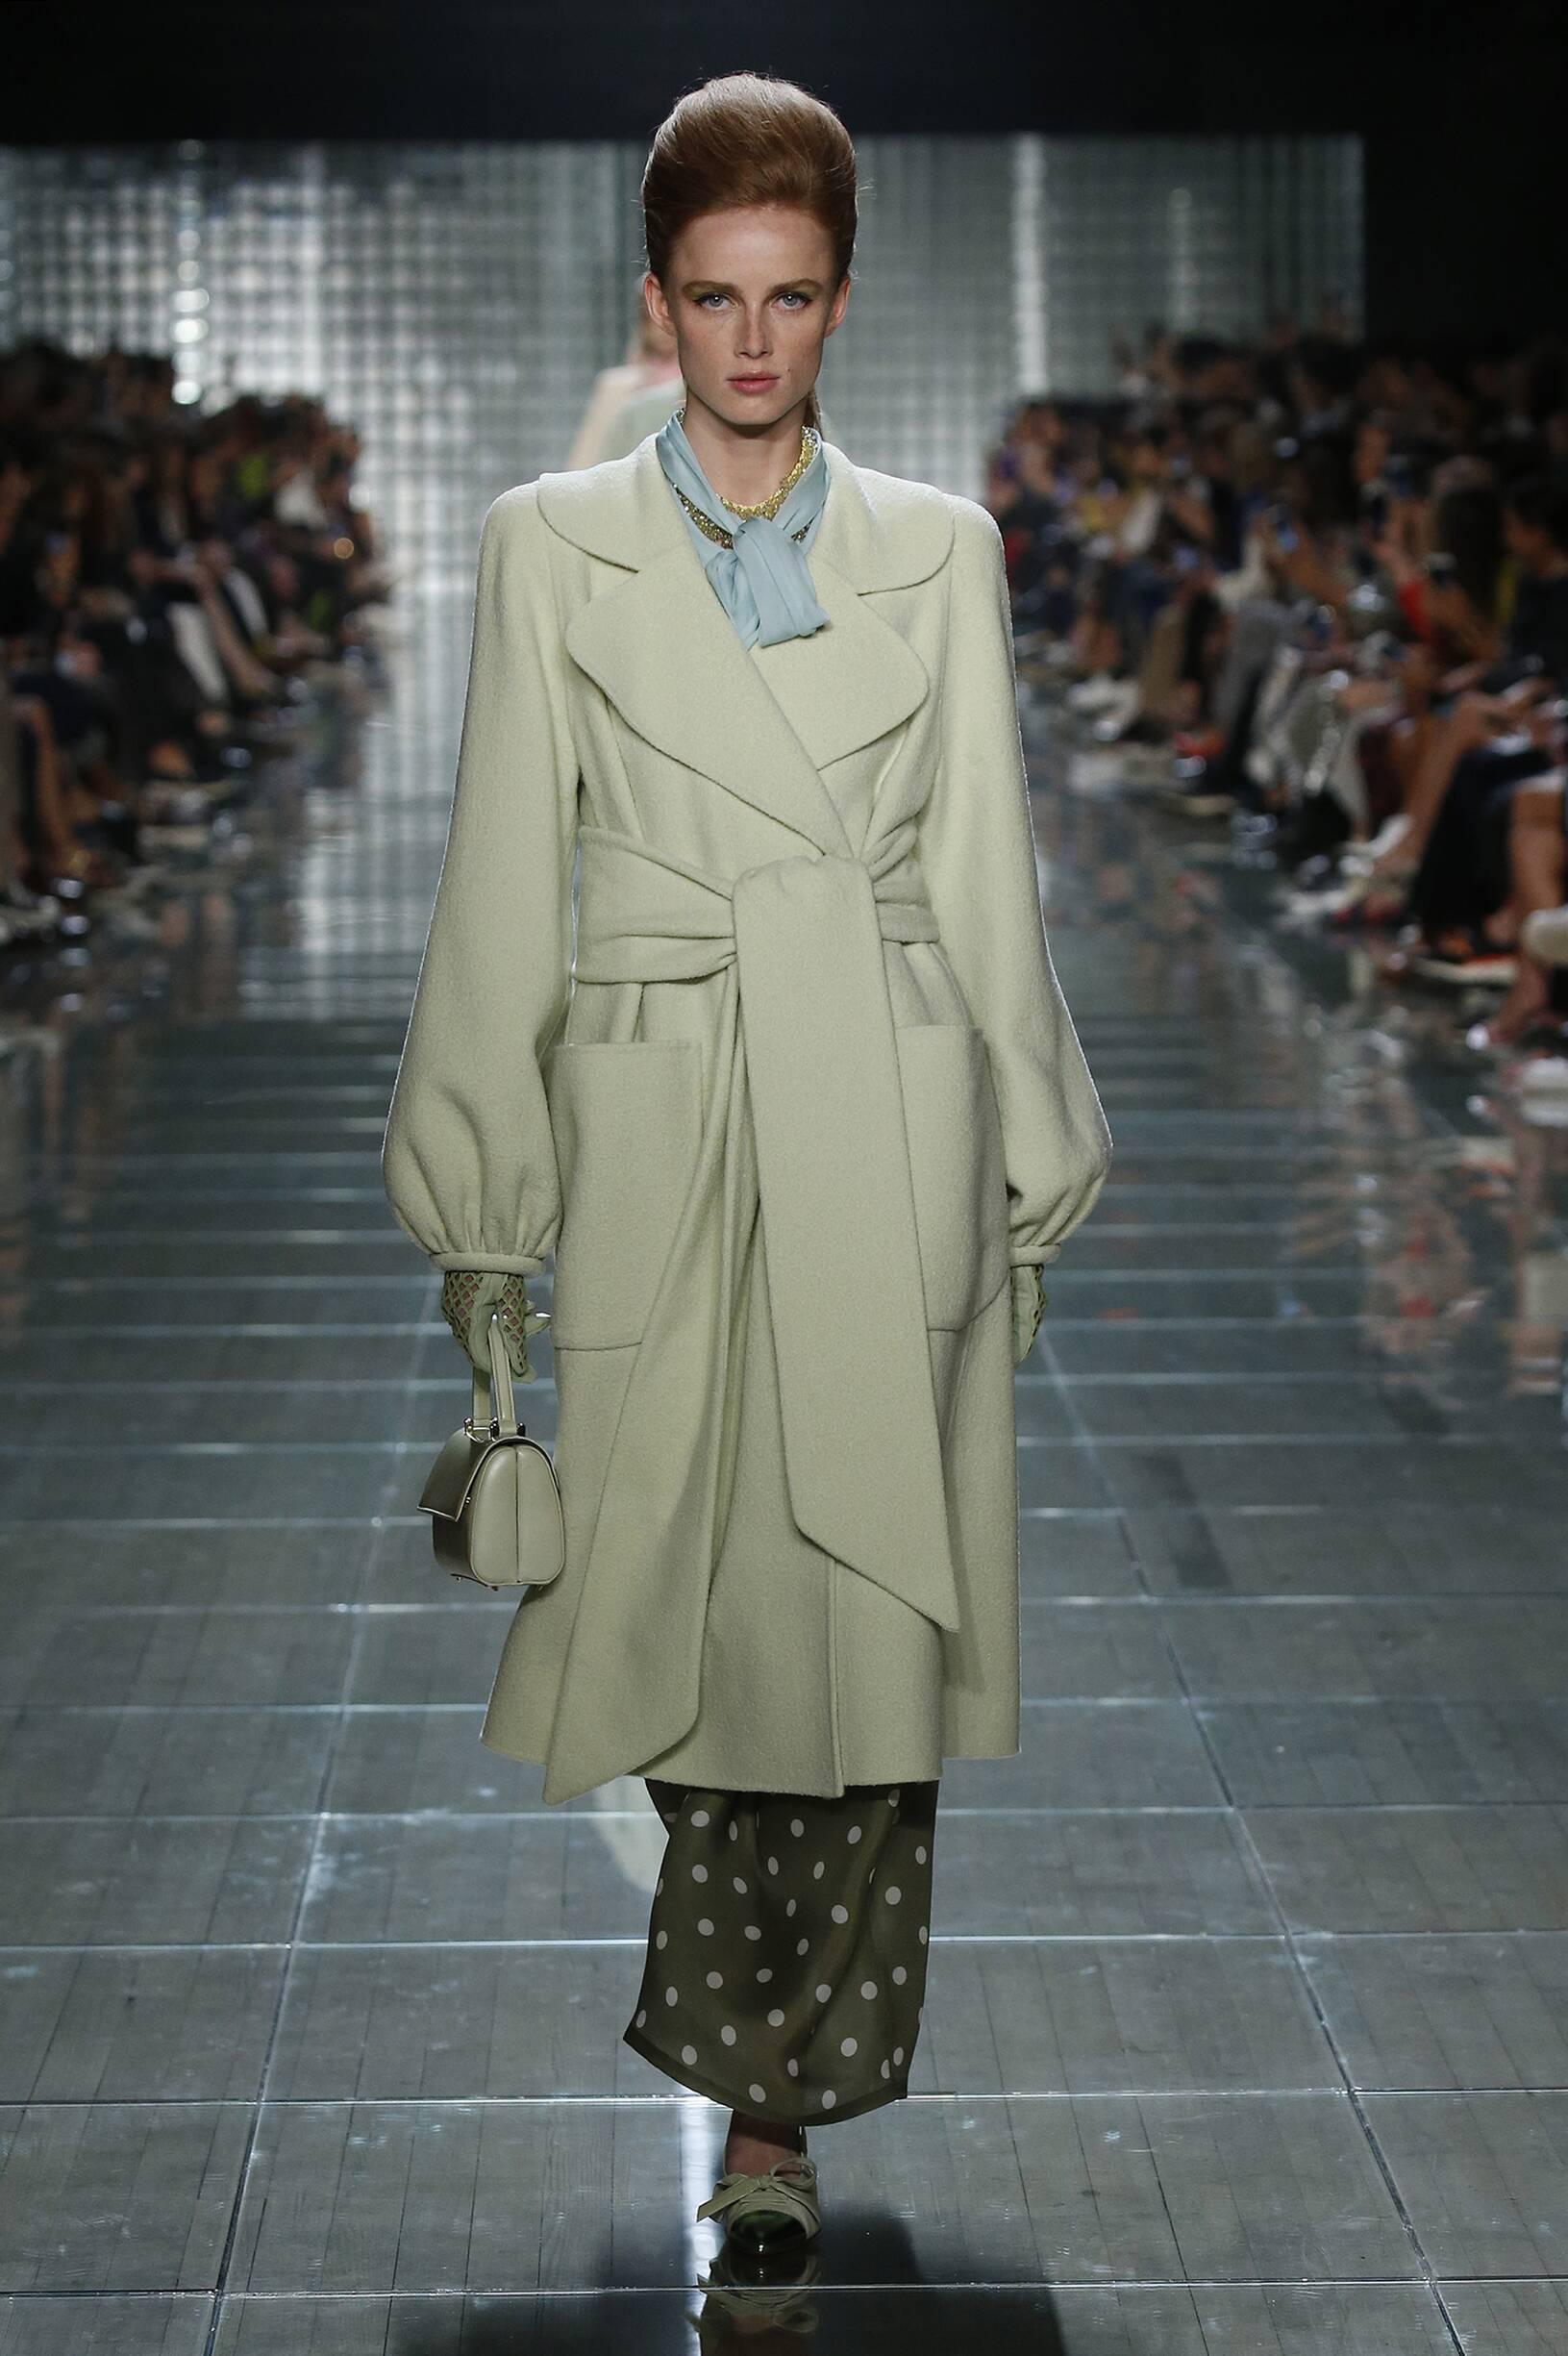 Marc Jacobs SS 2019 Womenswear